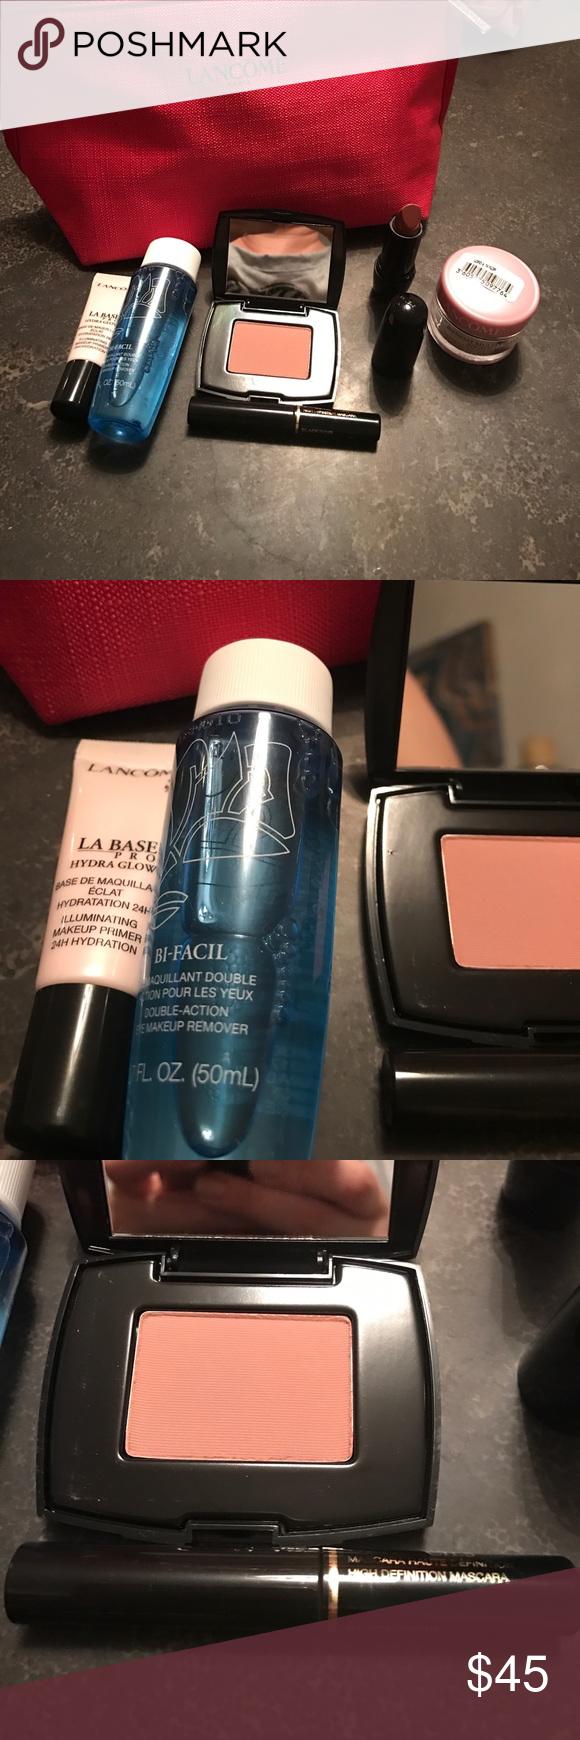 Lancôme 10 piece makeup bundle 👐🏼 NWT (With images